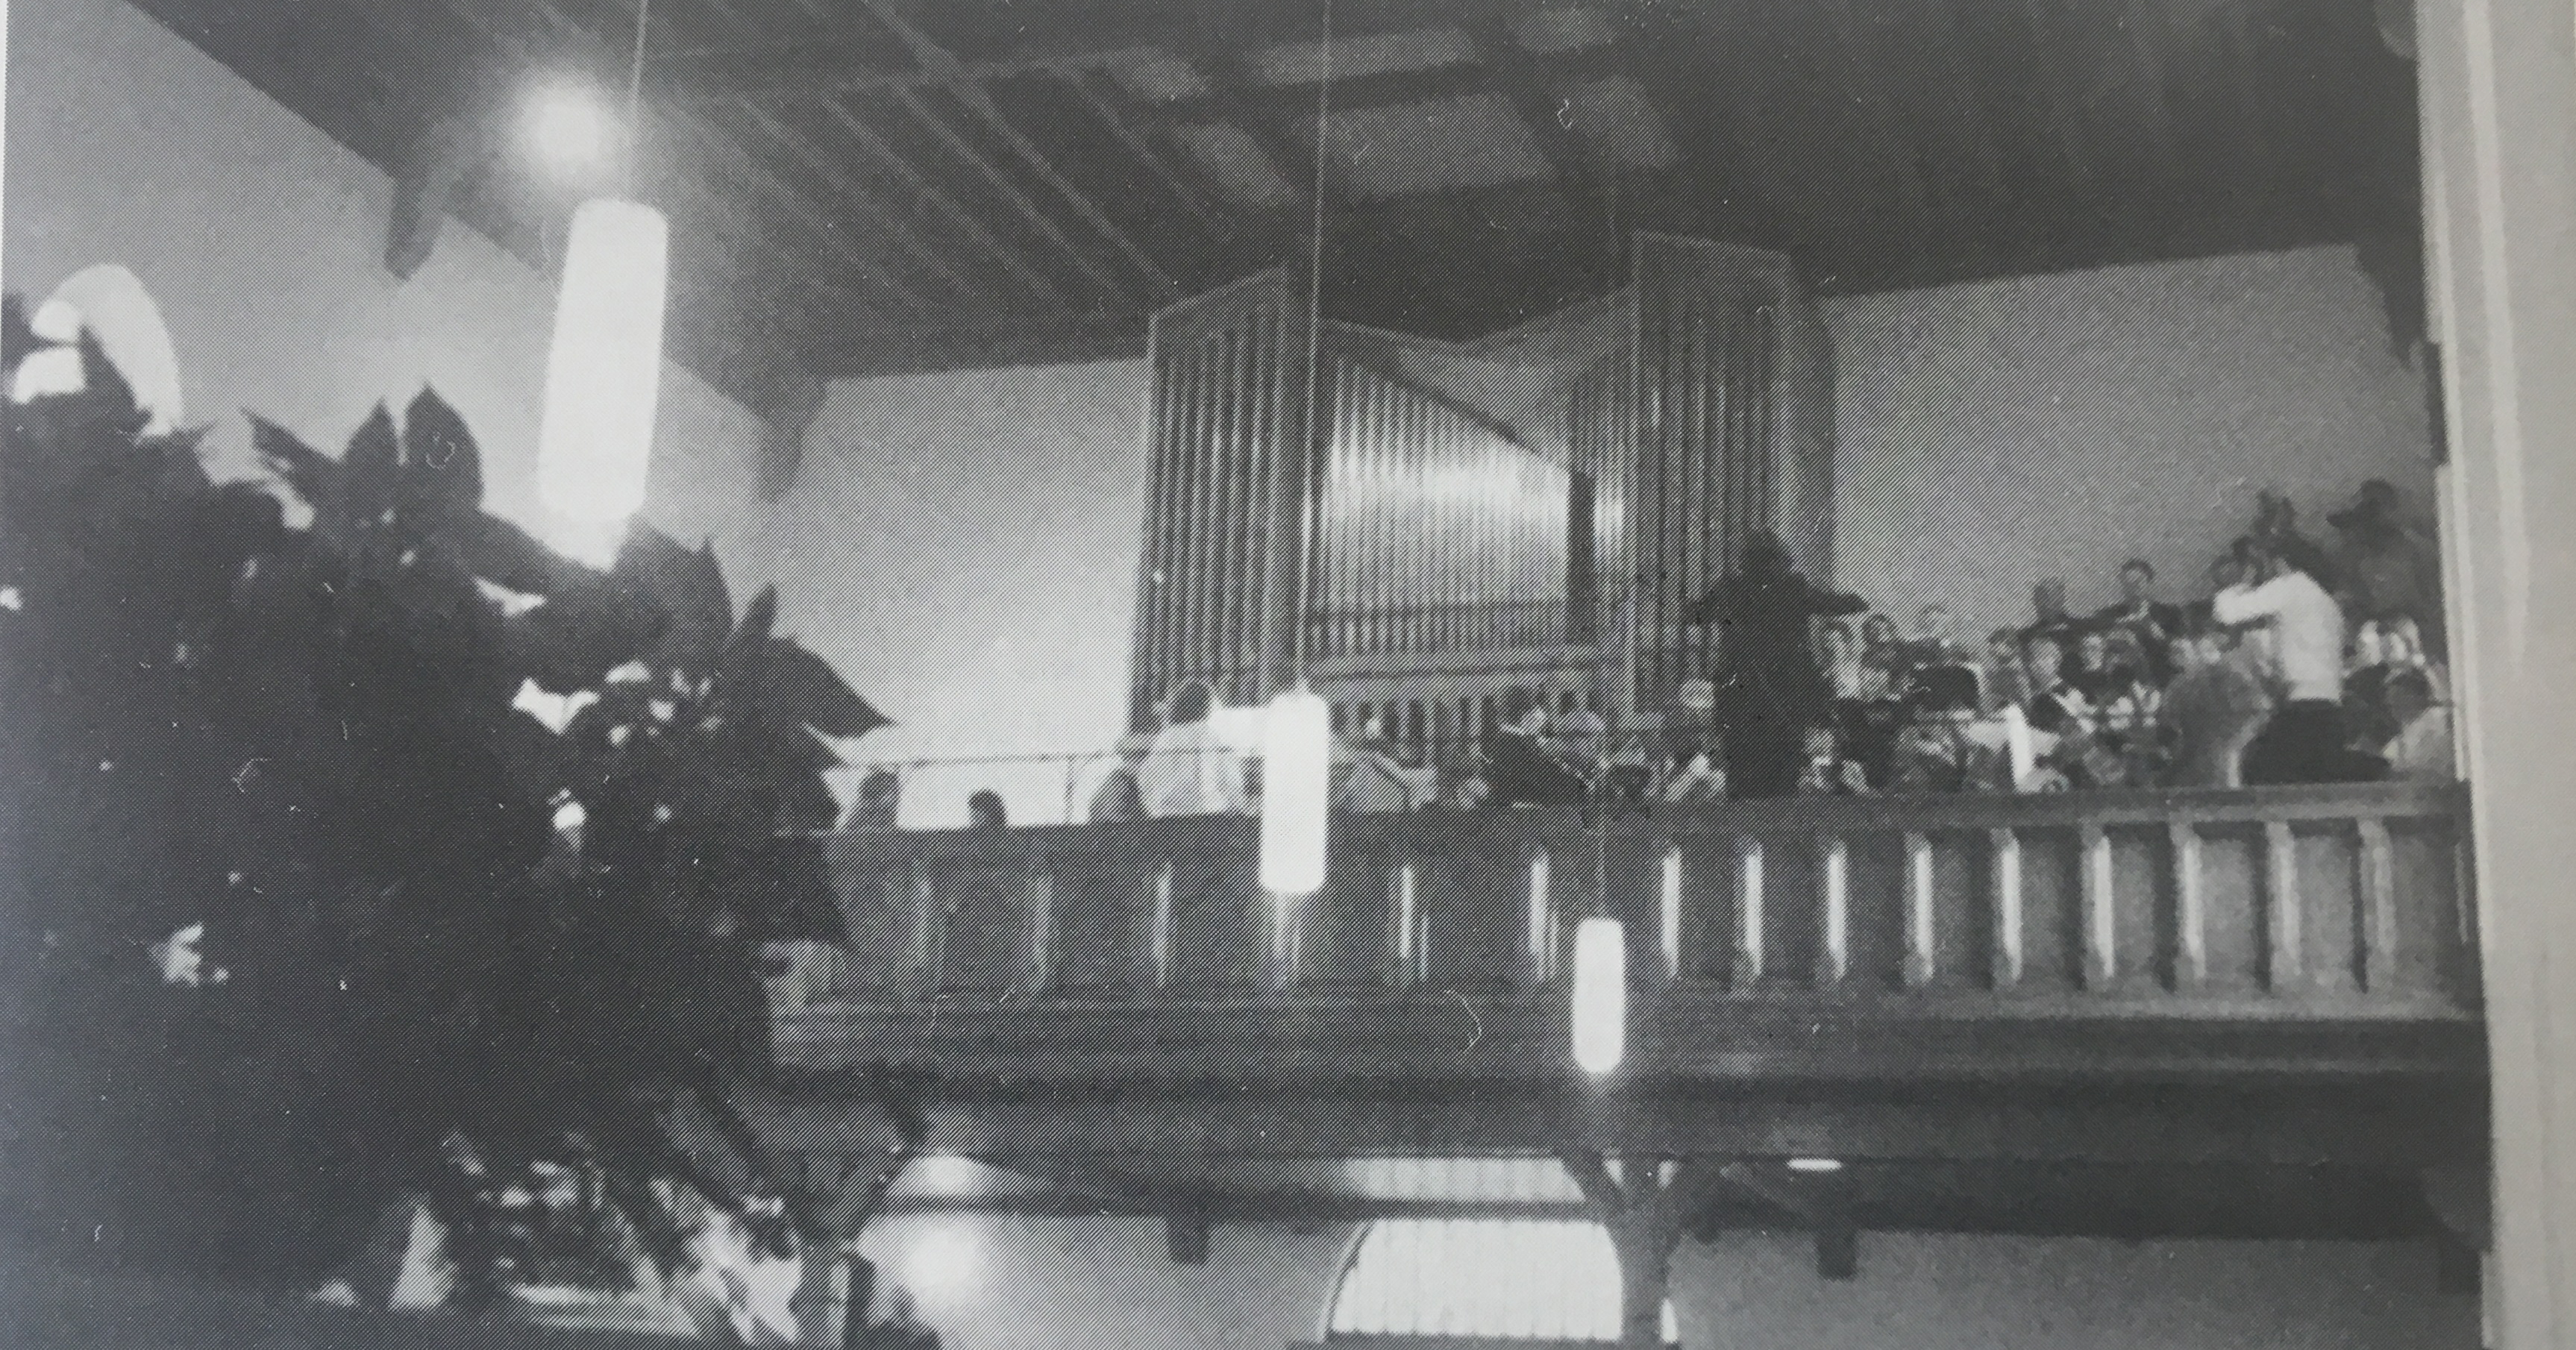 Späth-Orgel, St. Johannes Backnang